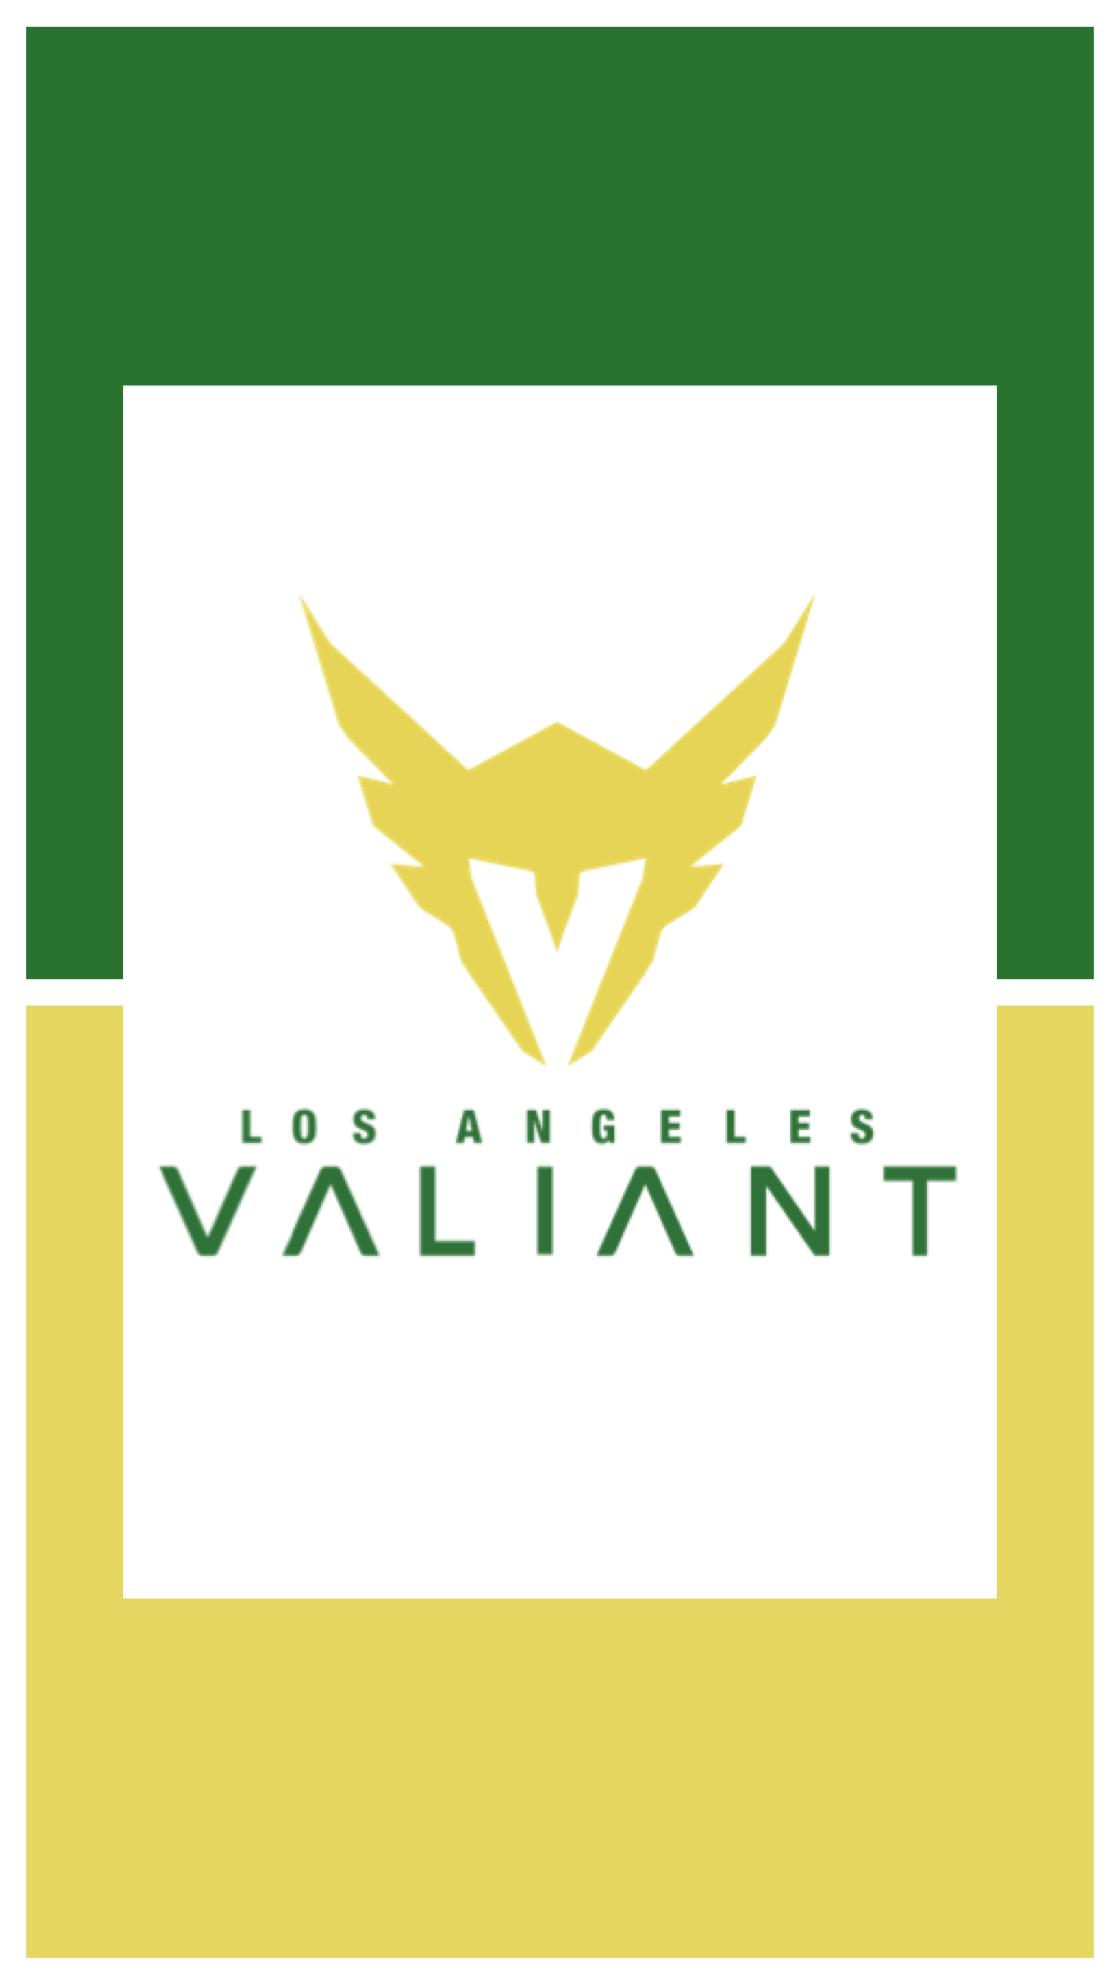 Los Angeles Valiant Overwatch Wallpapers Overwatch Logos